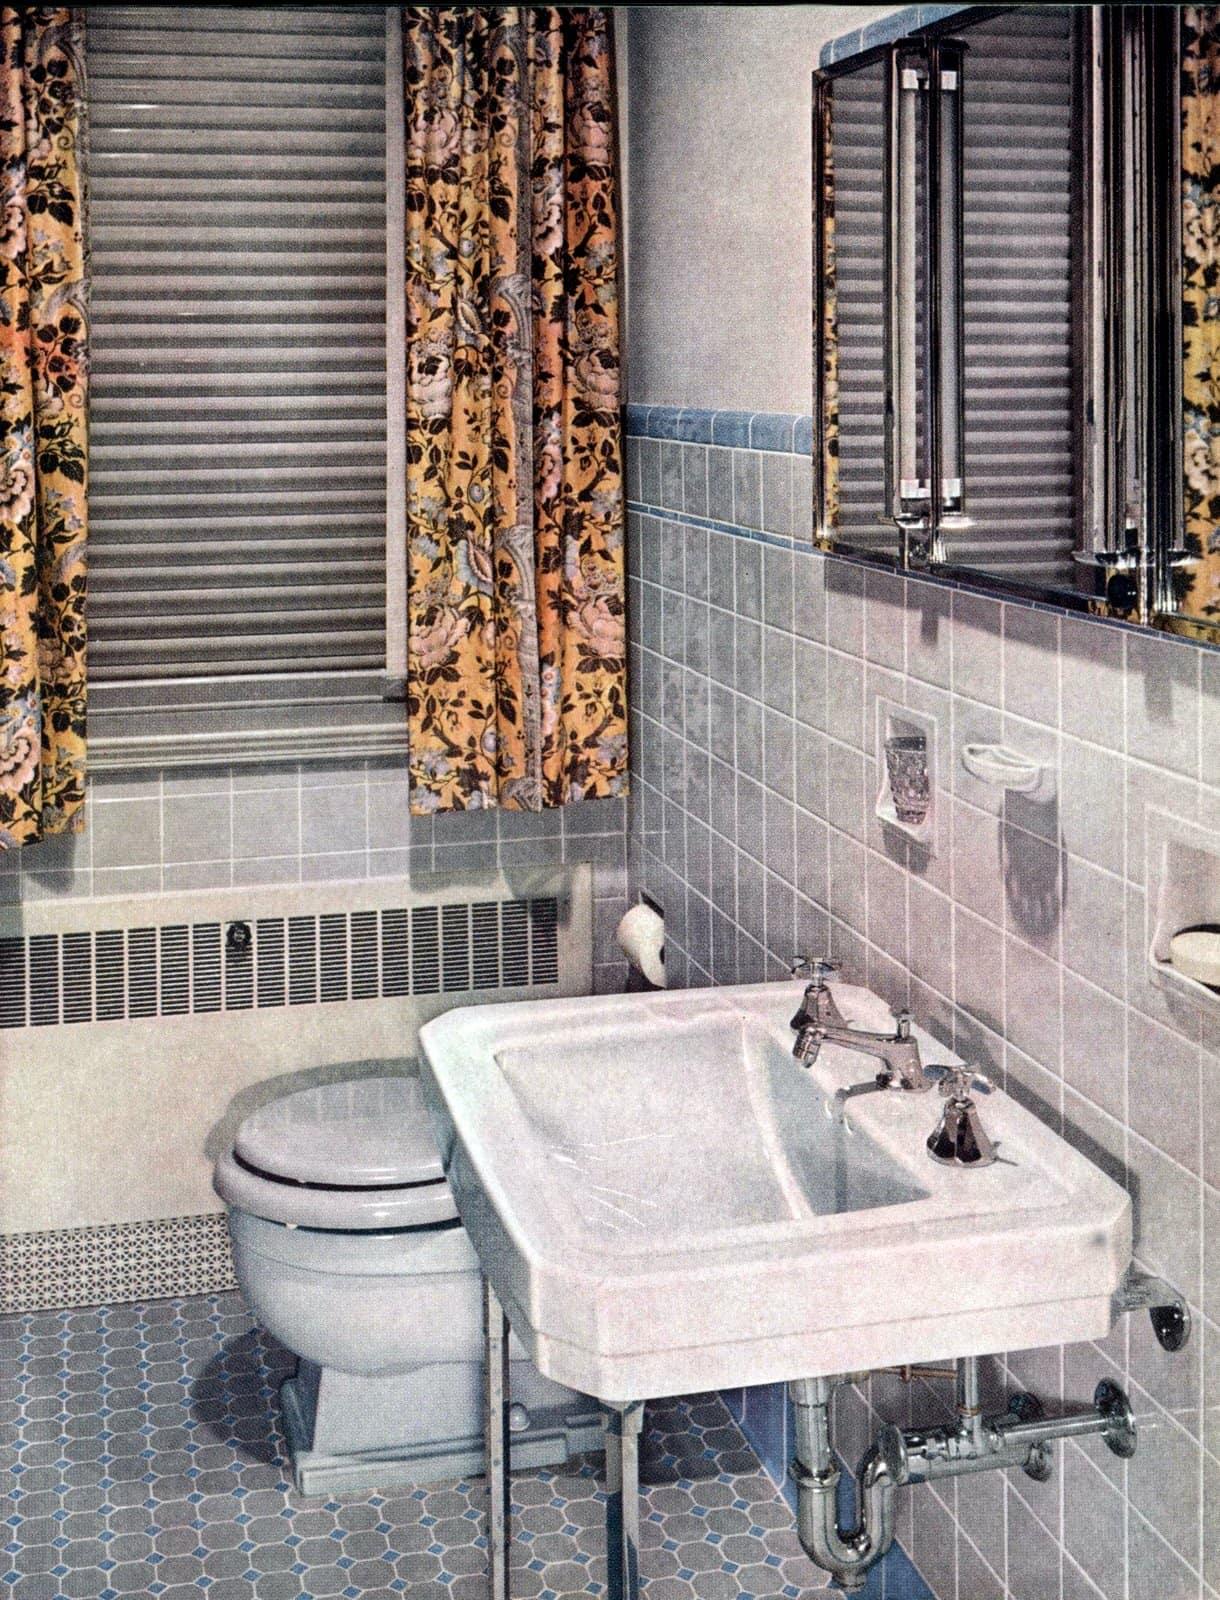 Grey tile vintage bathroom design from the 1950s